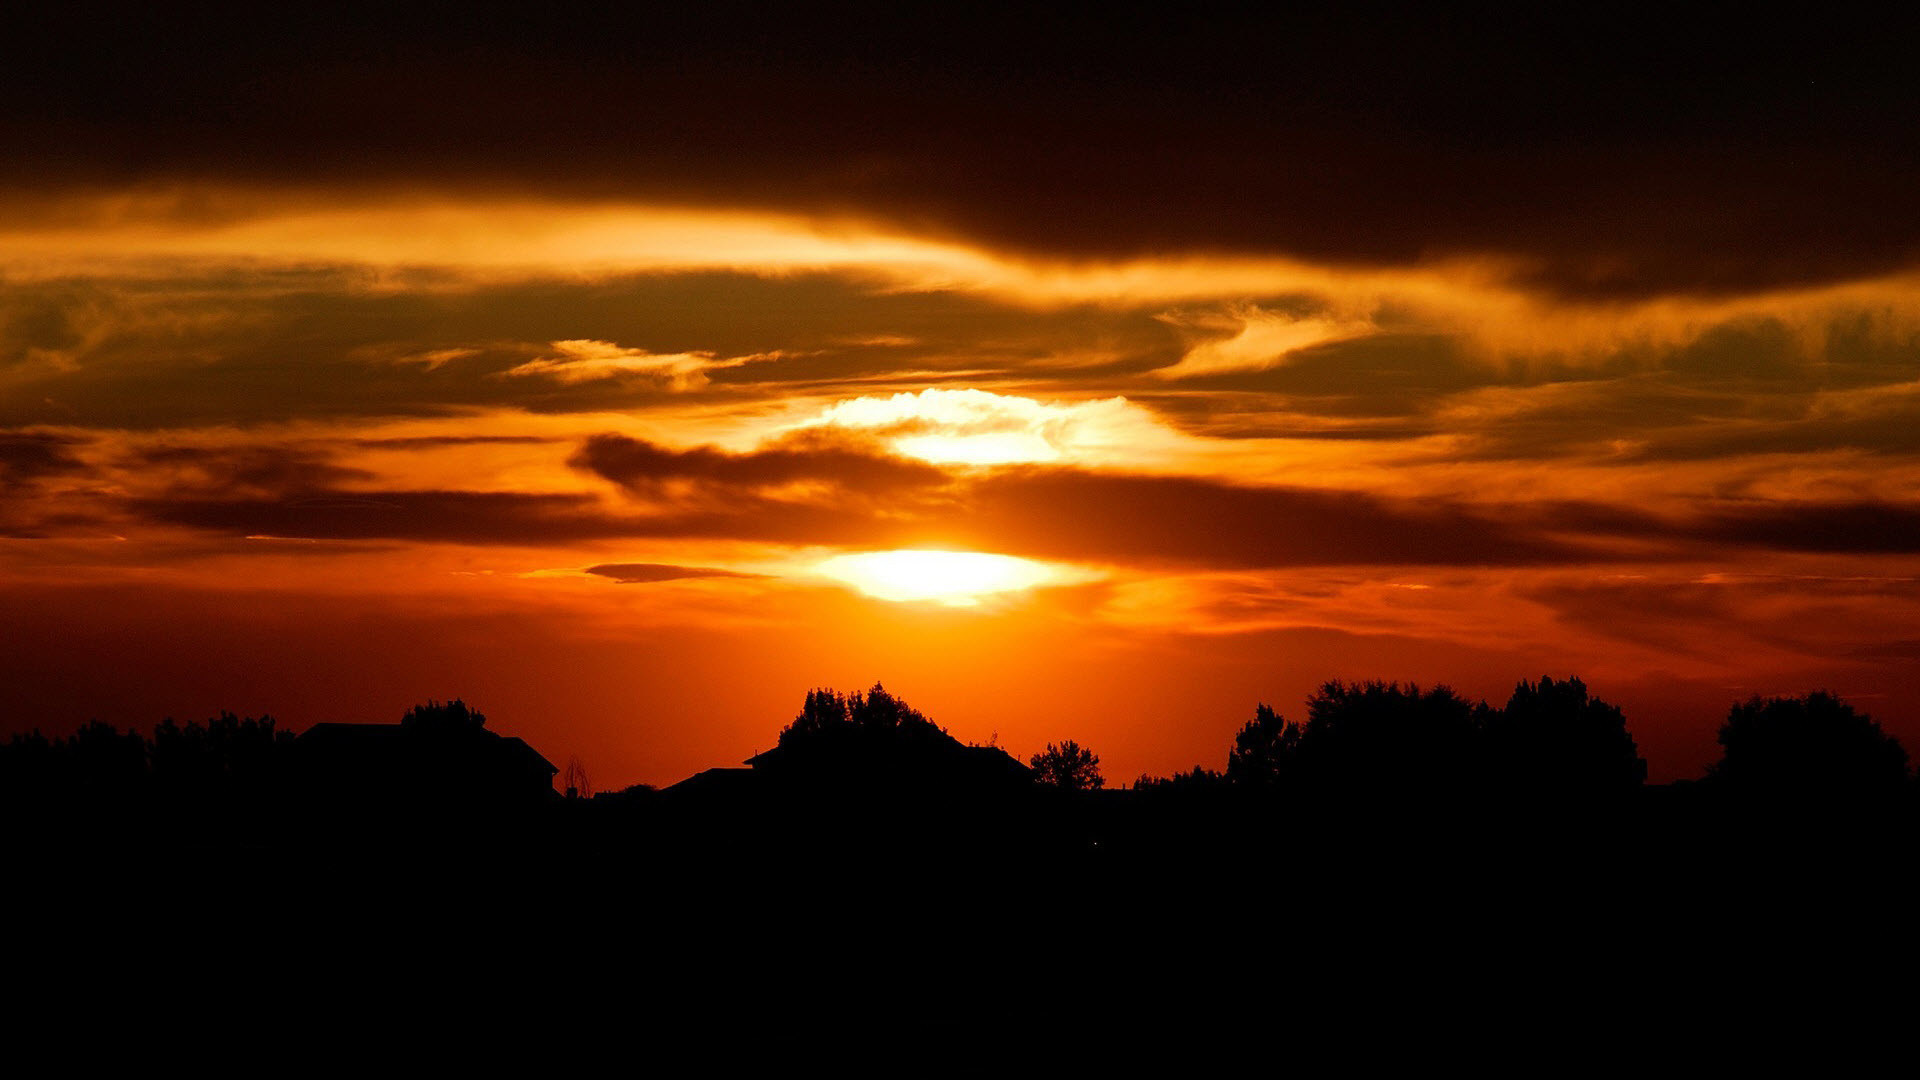 2560x1600 Sunset Wallpapers Desktop Download Hd Amazing Cool Apple Mac Tablet Free 2560A 1600 Wallpaper HD